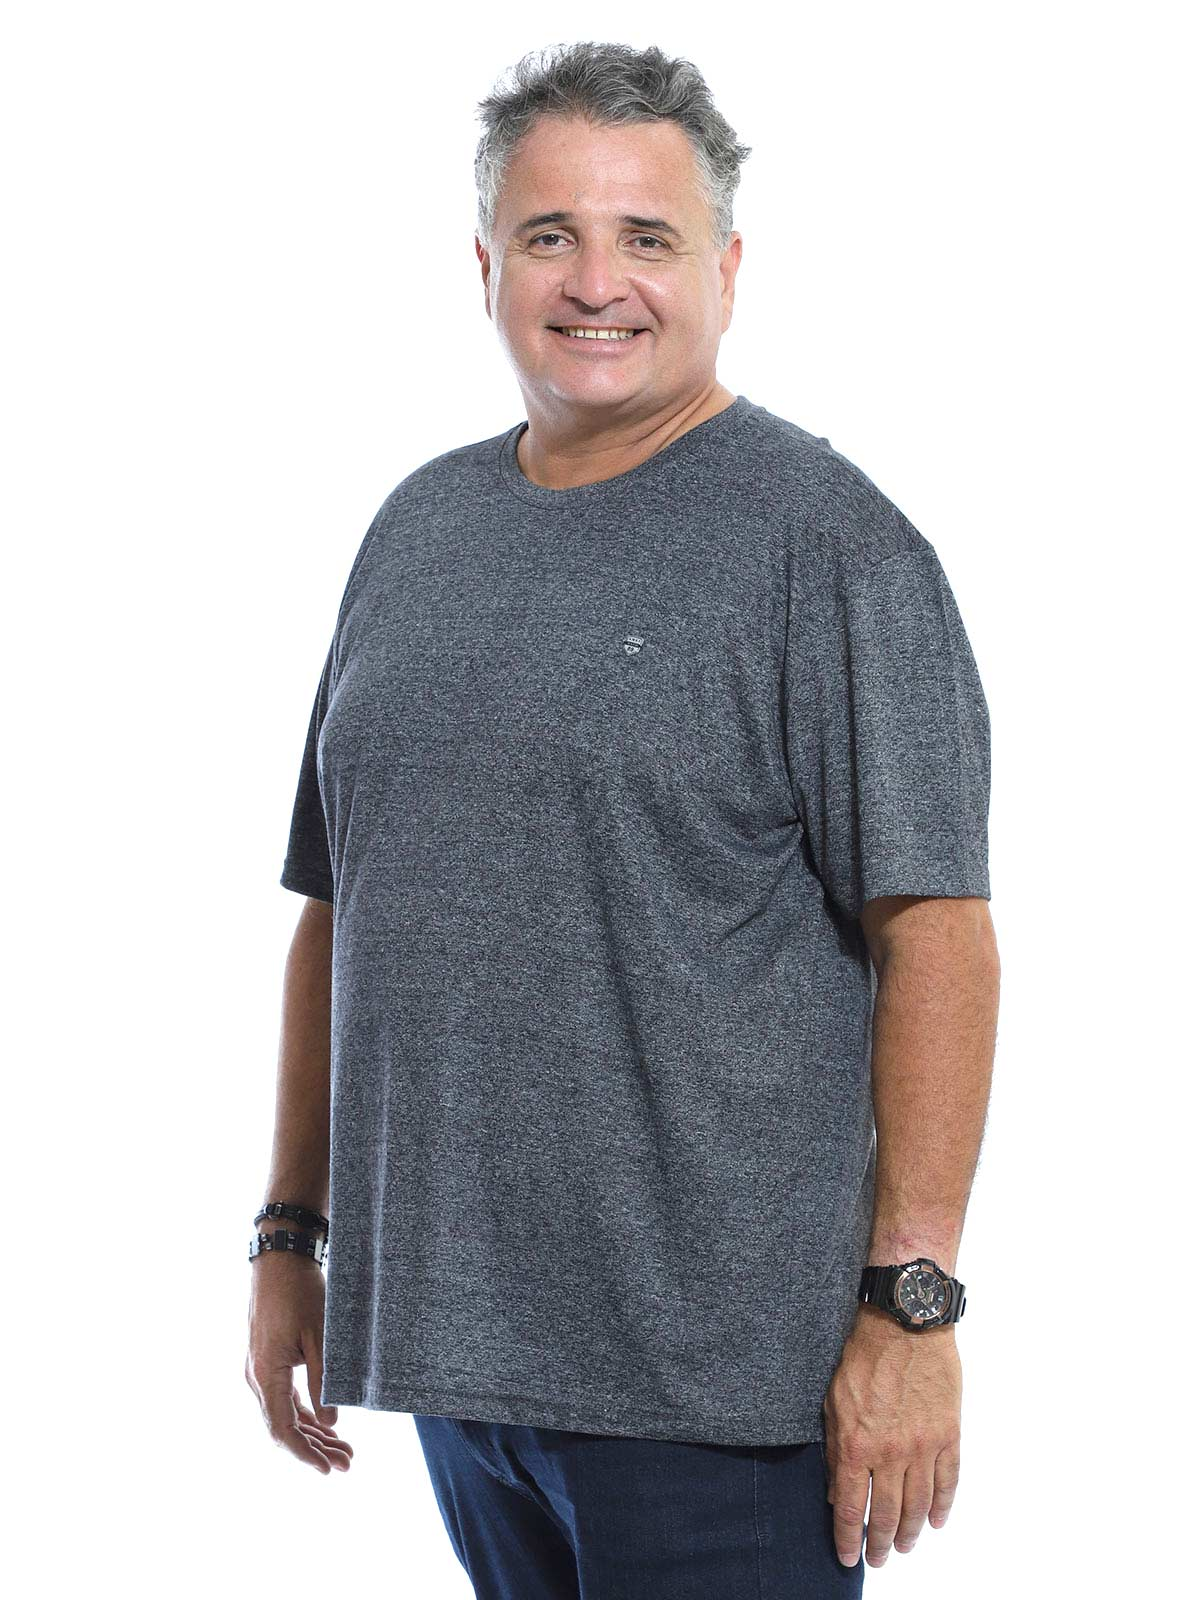 Camiseta Plus Size Masculina Mouline Preto